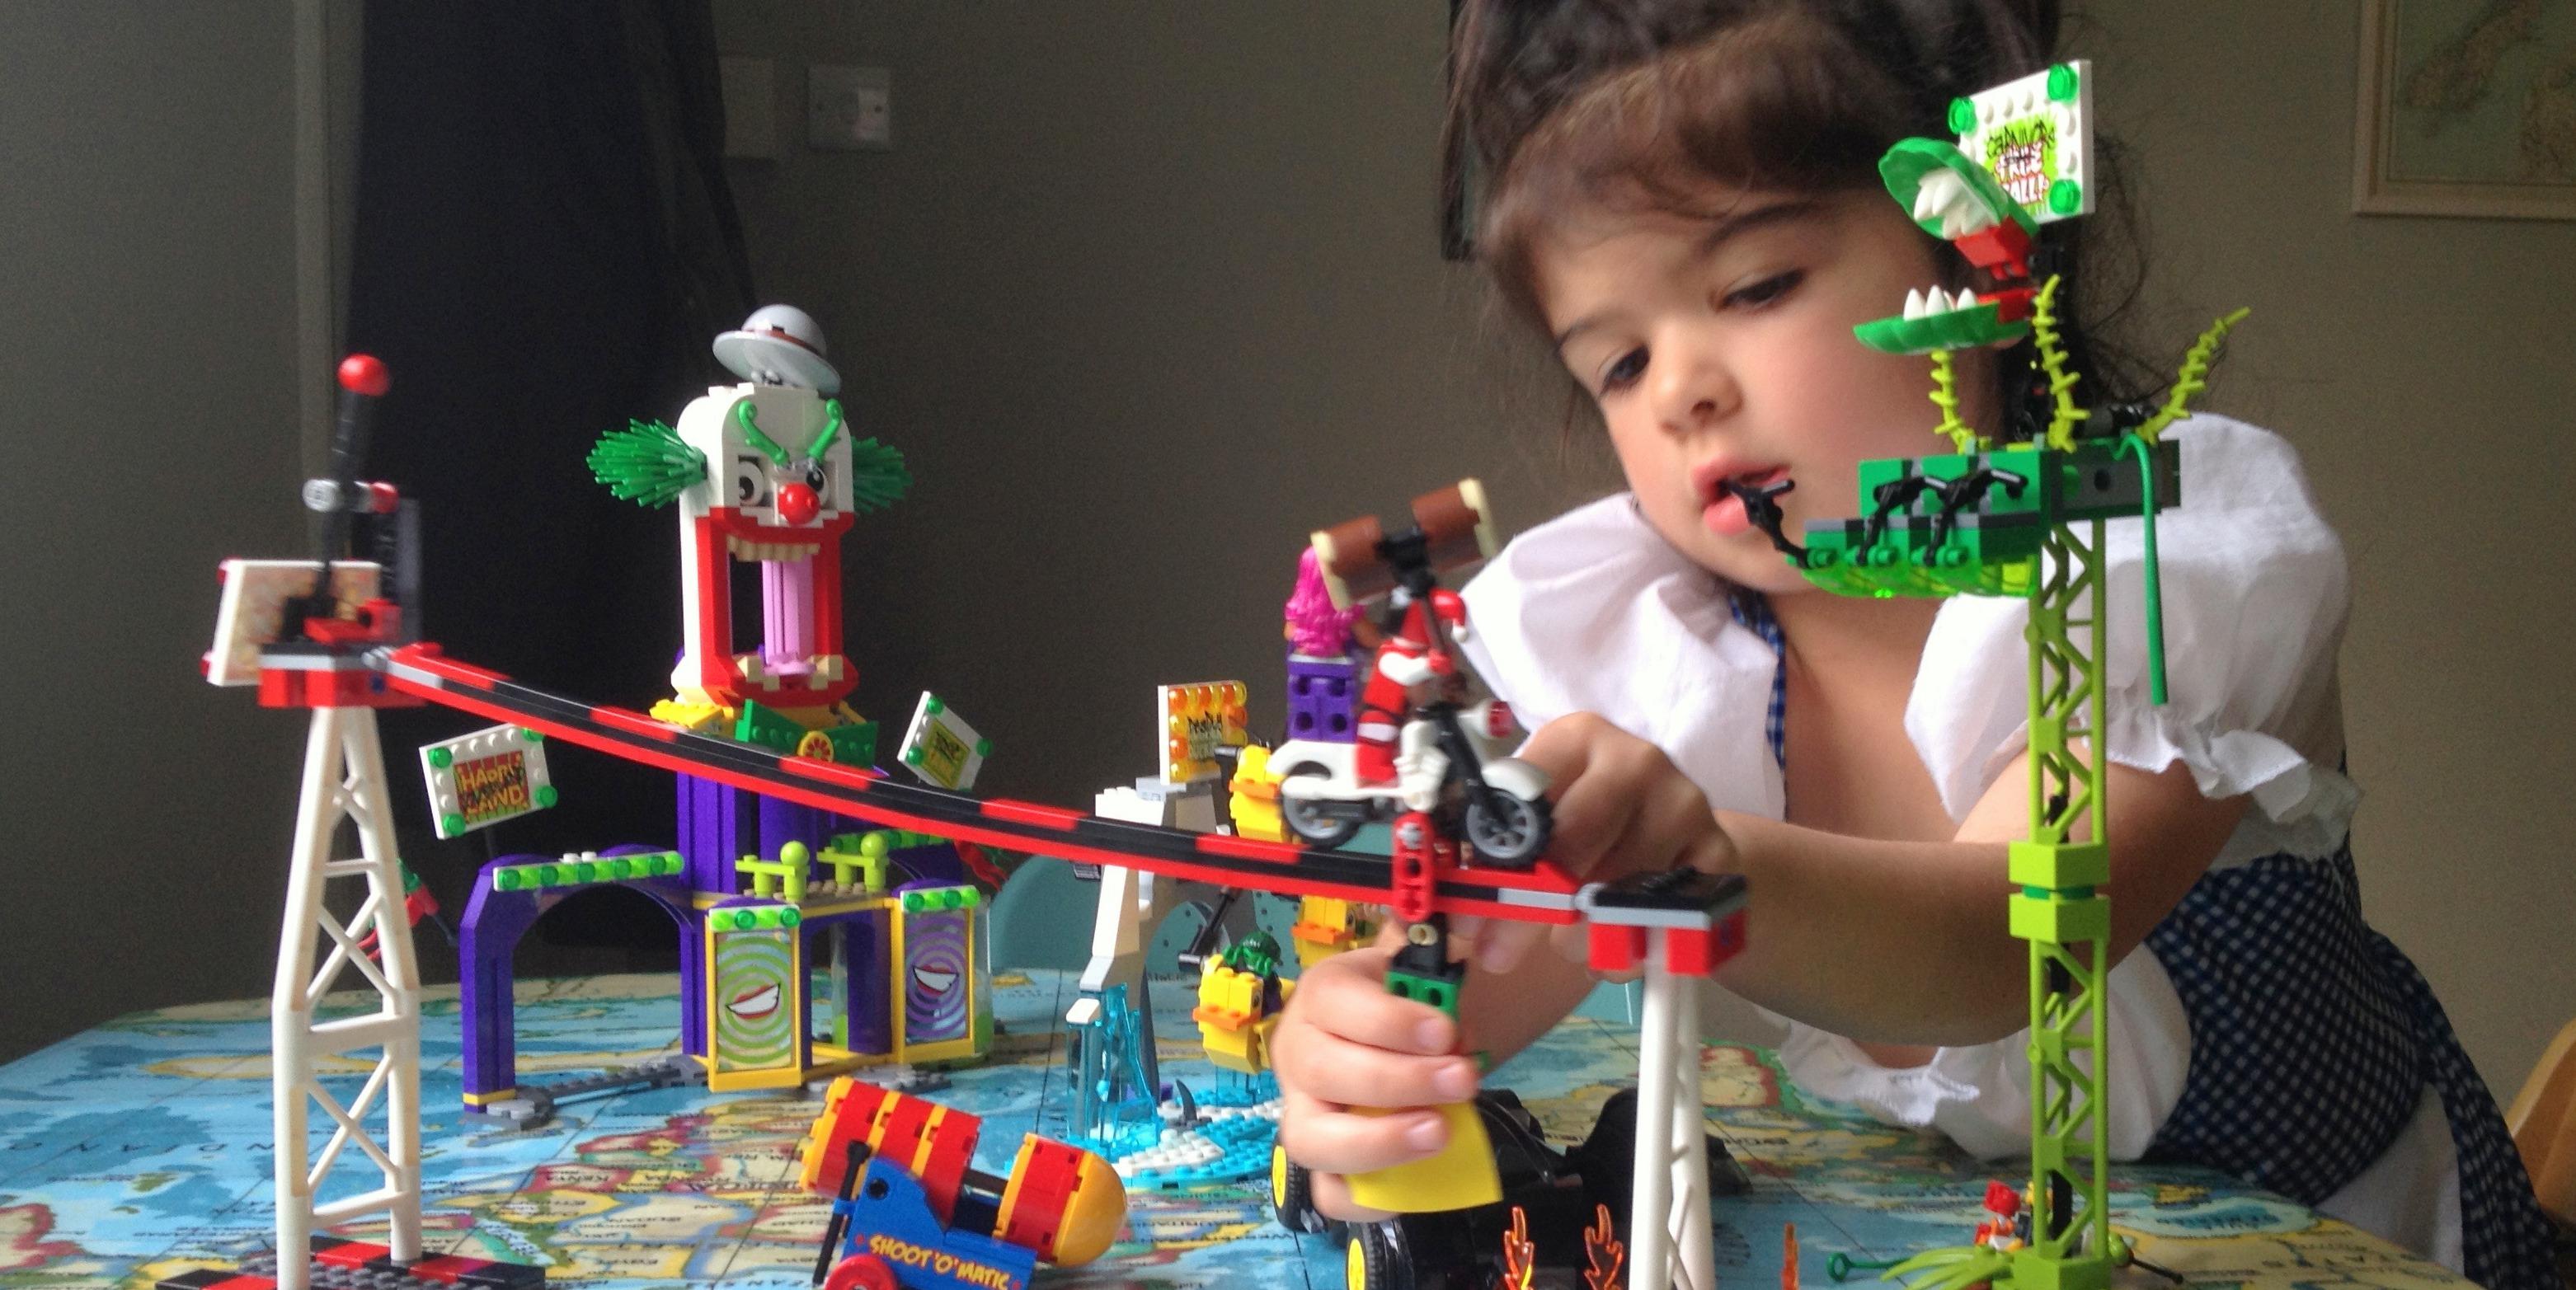 LEGO NEW POSION IVY BATMAN MINIFIGURE FROM JOKERLAND SET 76035